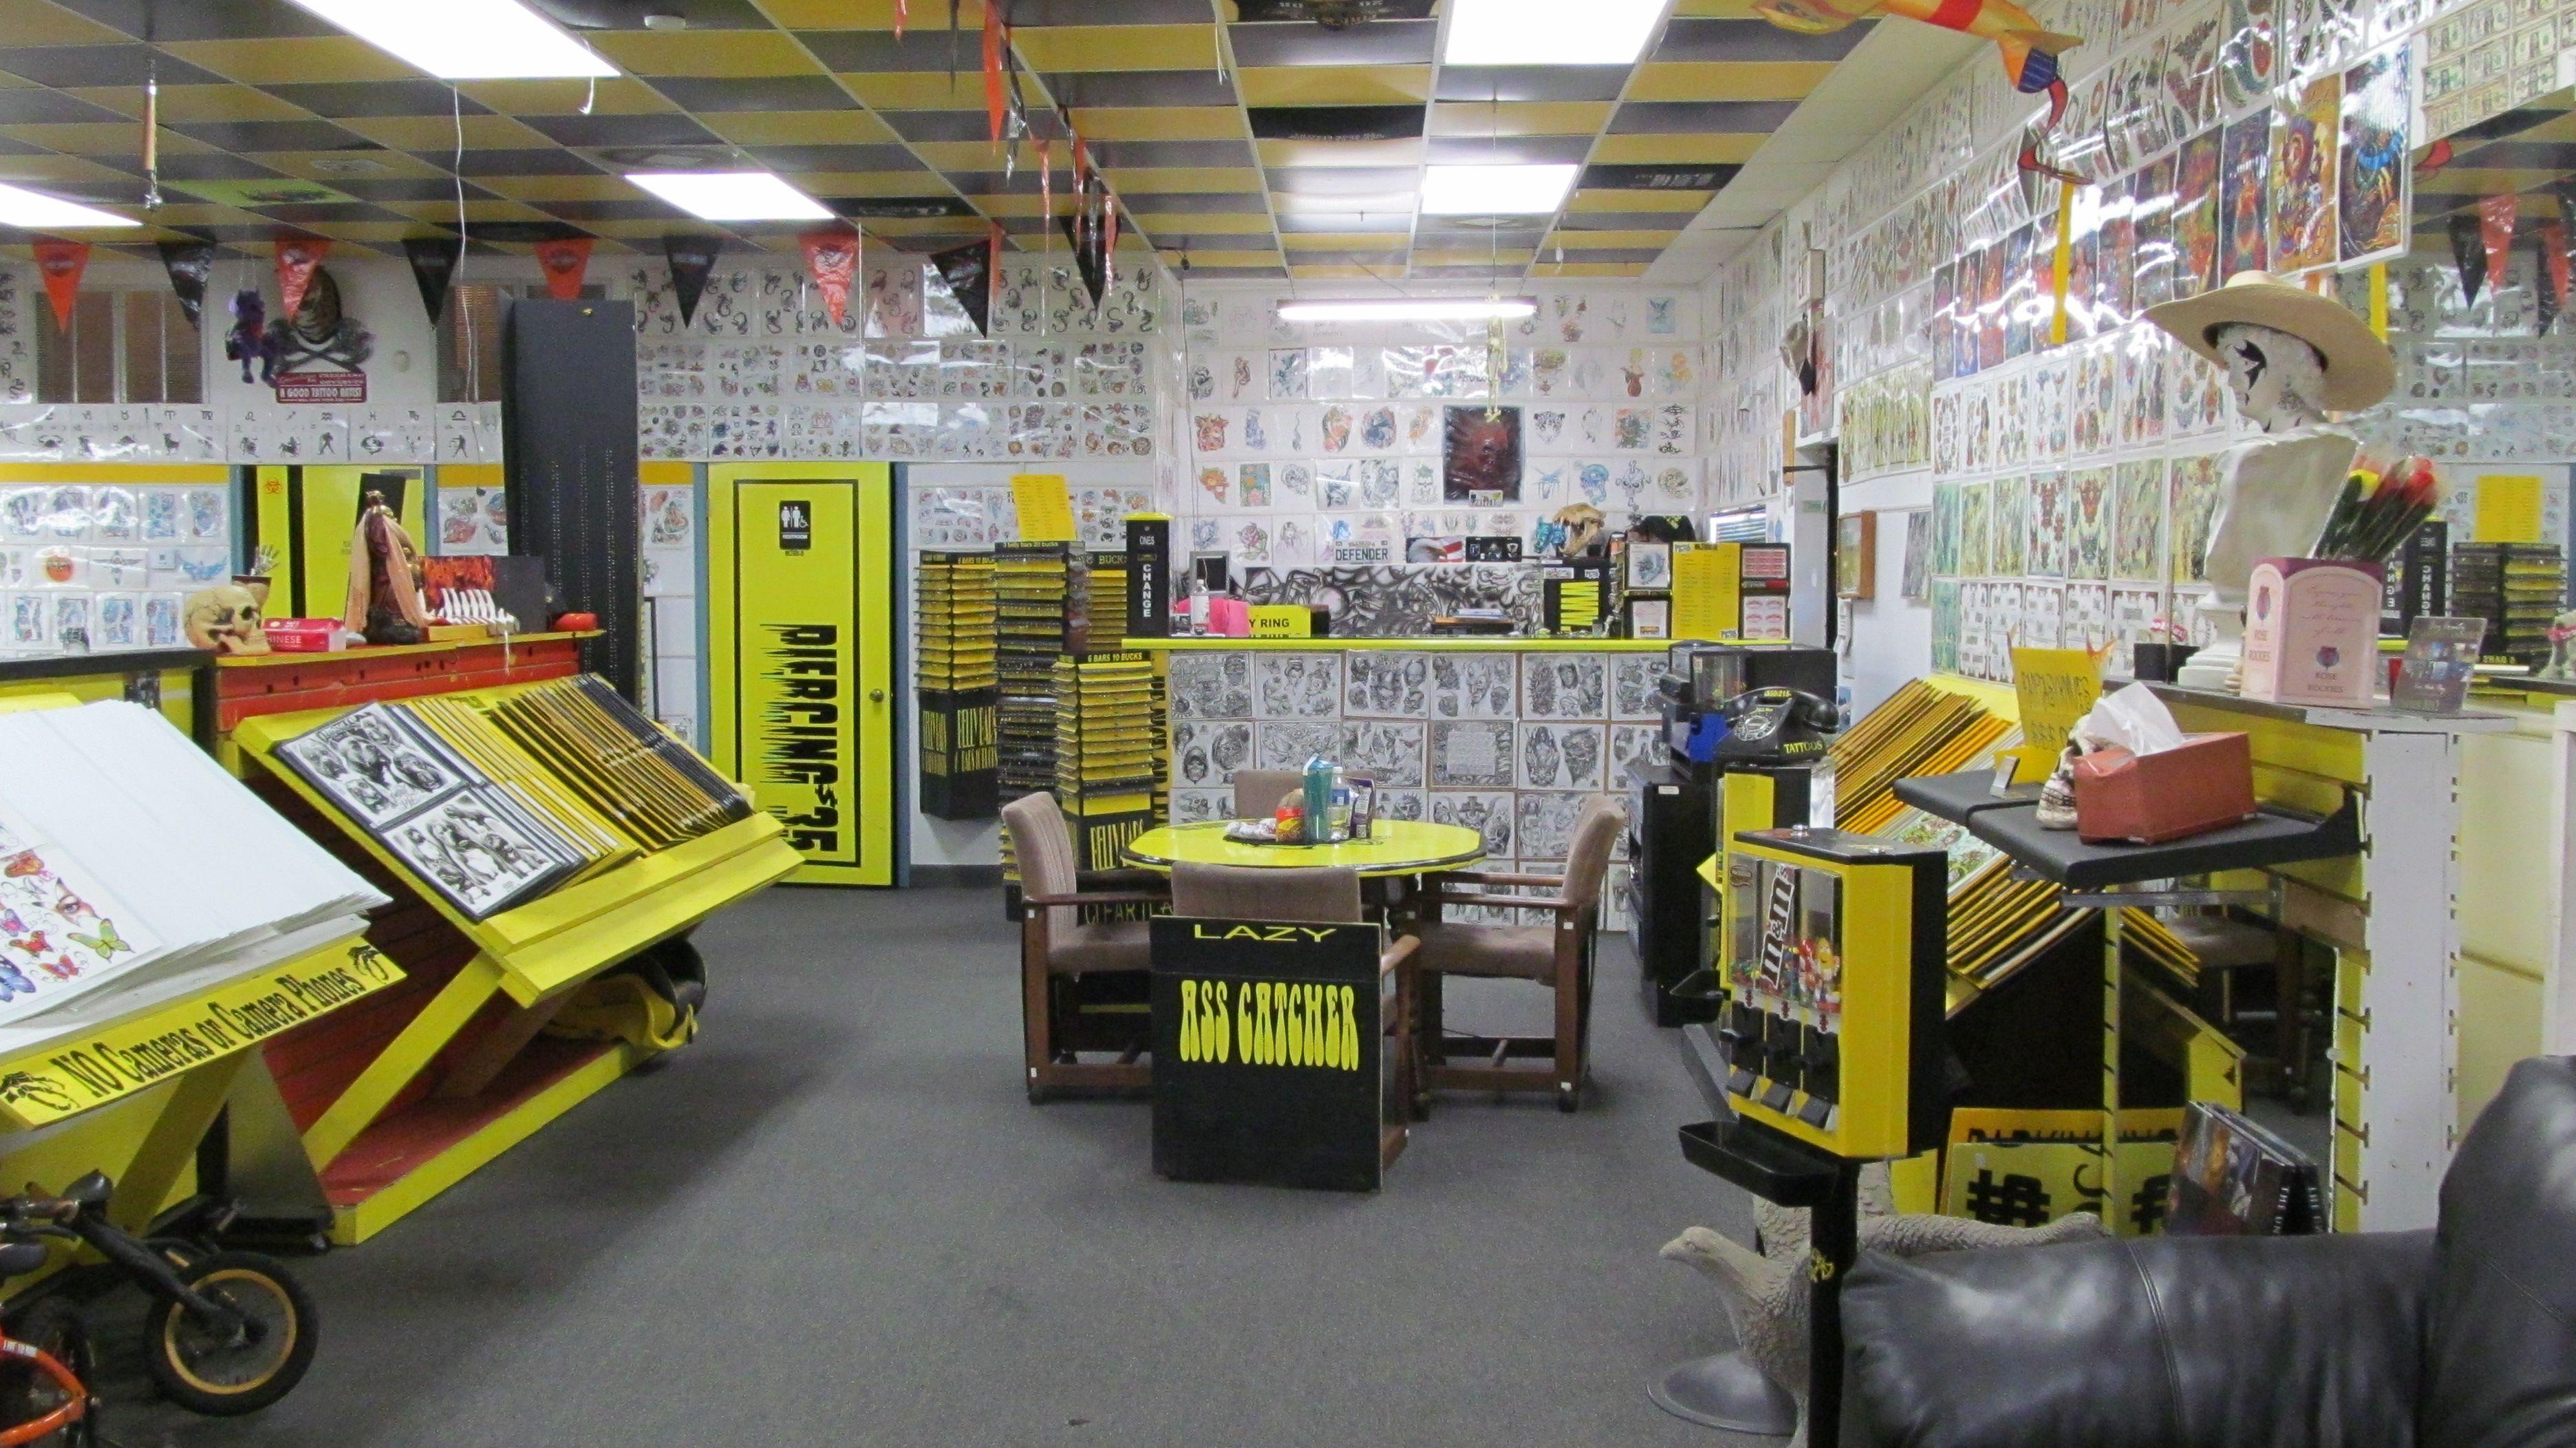 tattoo shops near me, tattoo shops in panama city florida